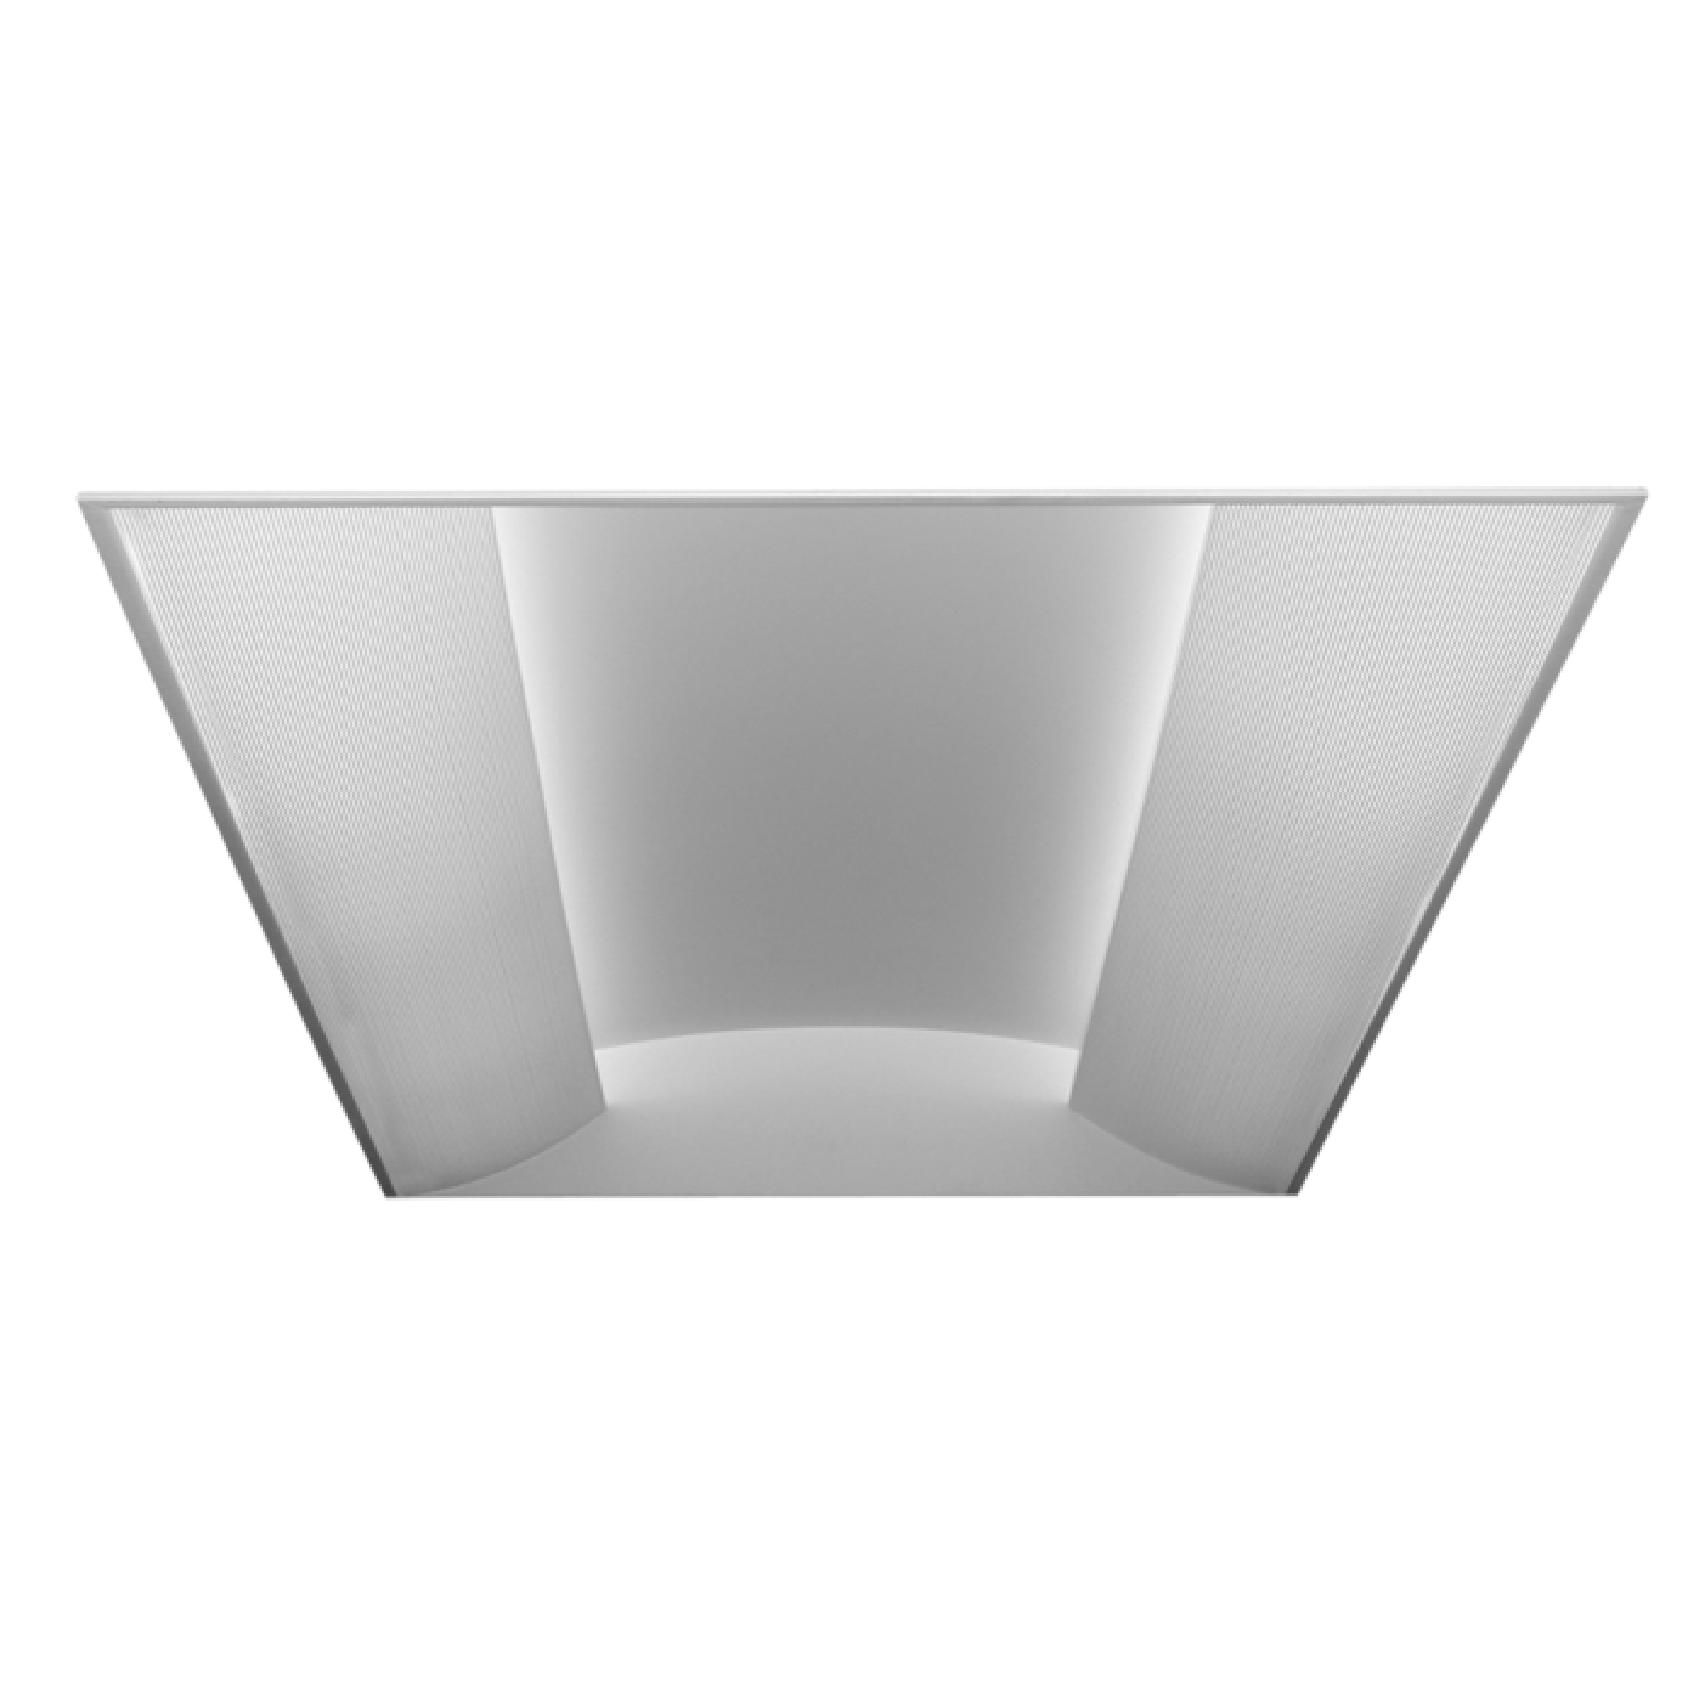 Alcon Lighting 7018 Side Basket 2x2 Fluorescent Recessed Troffer ...